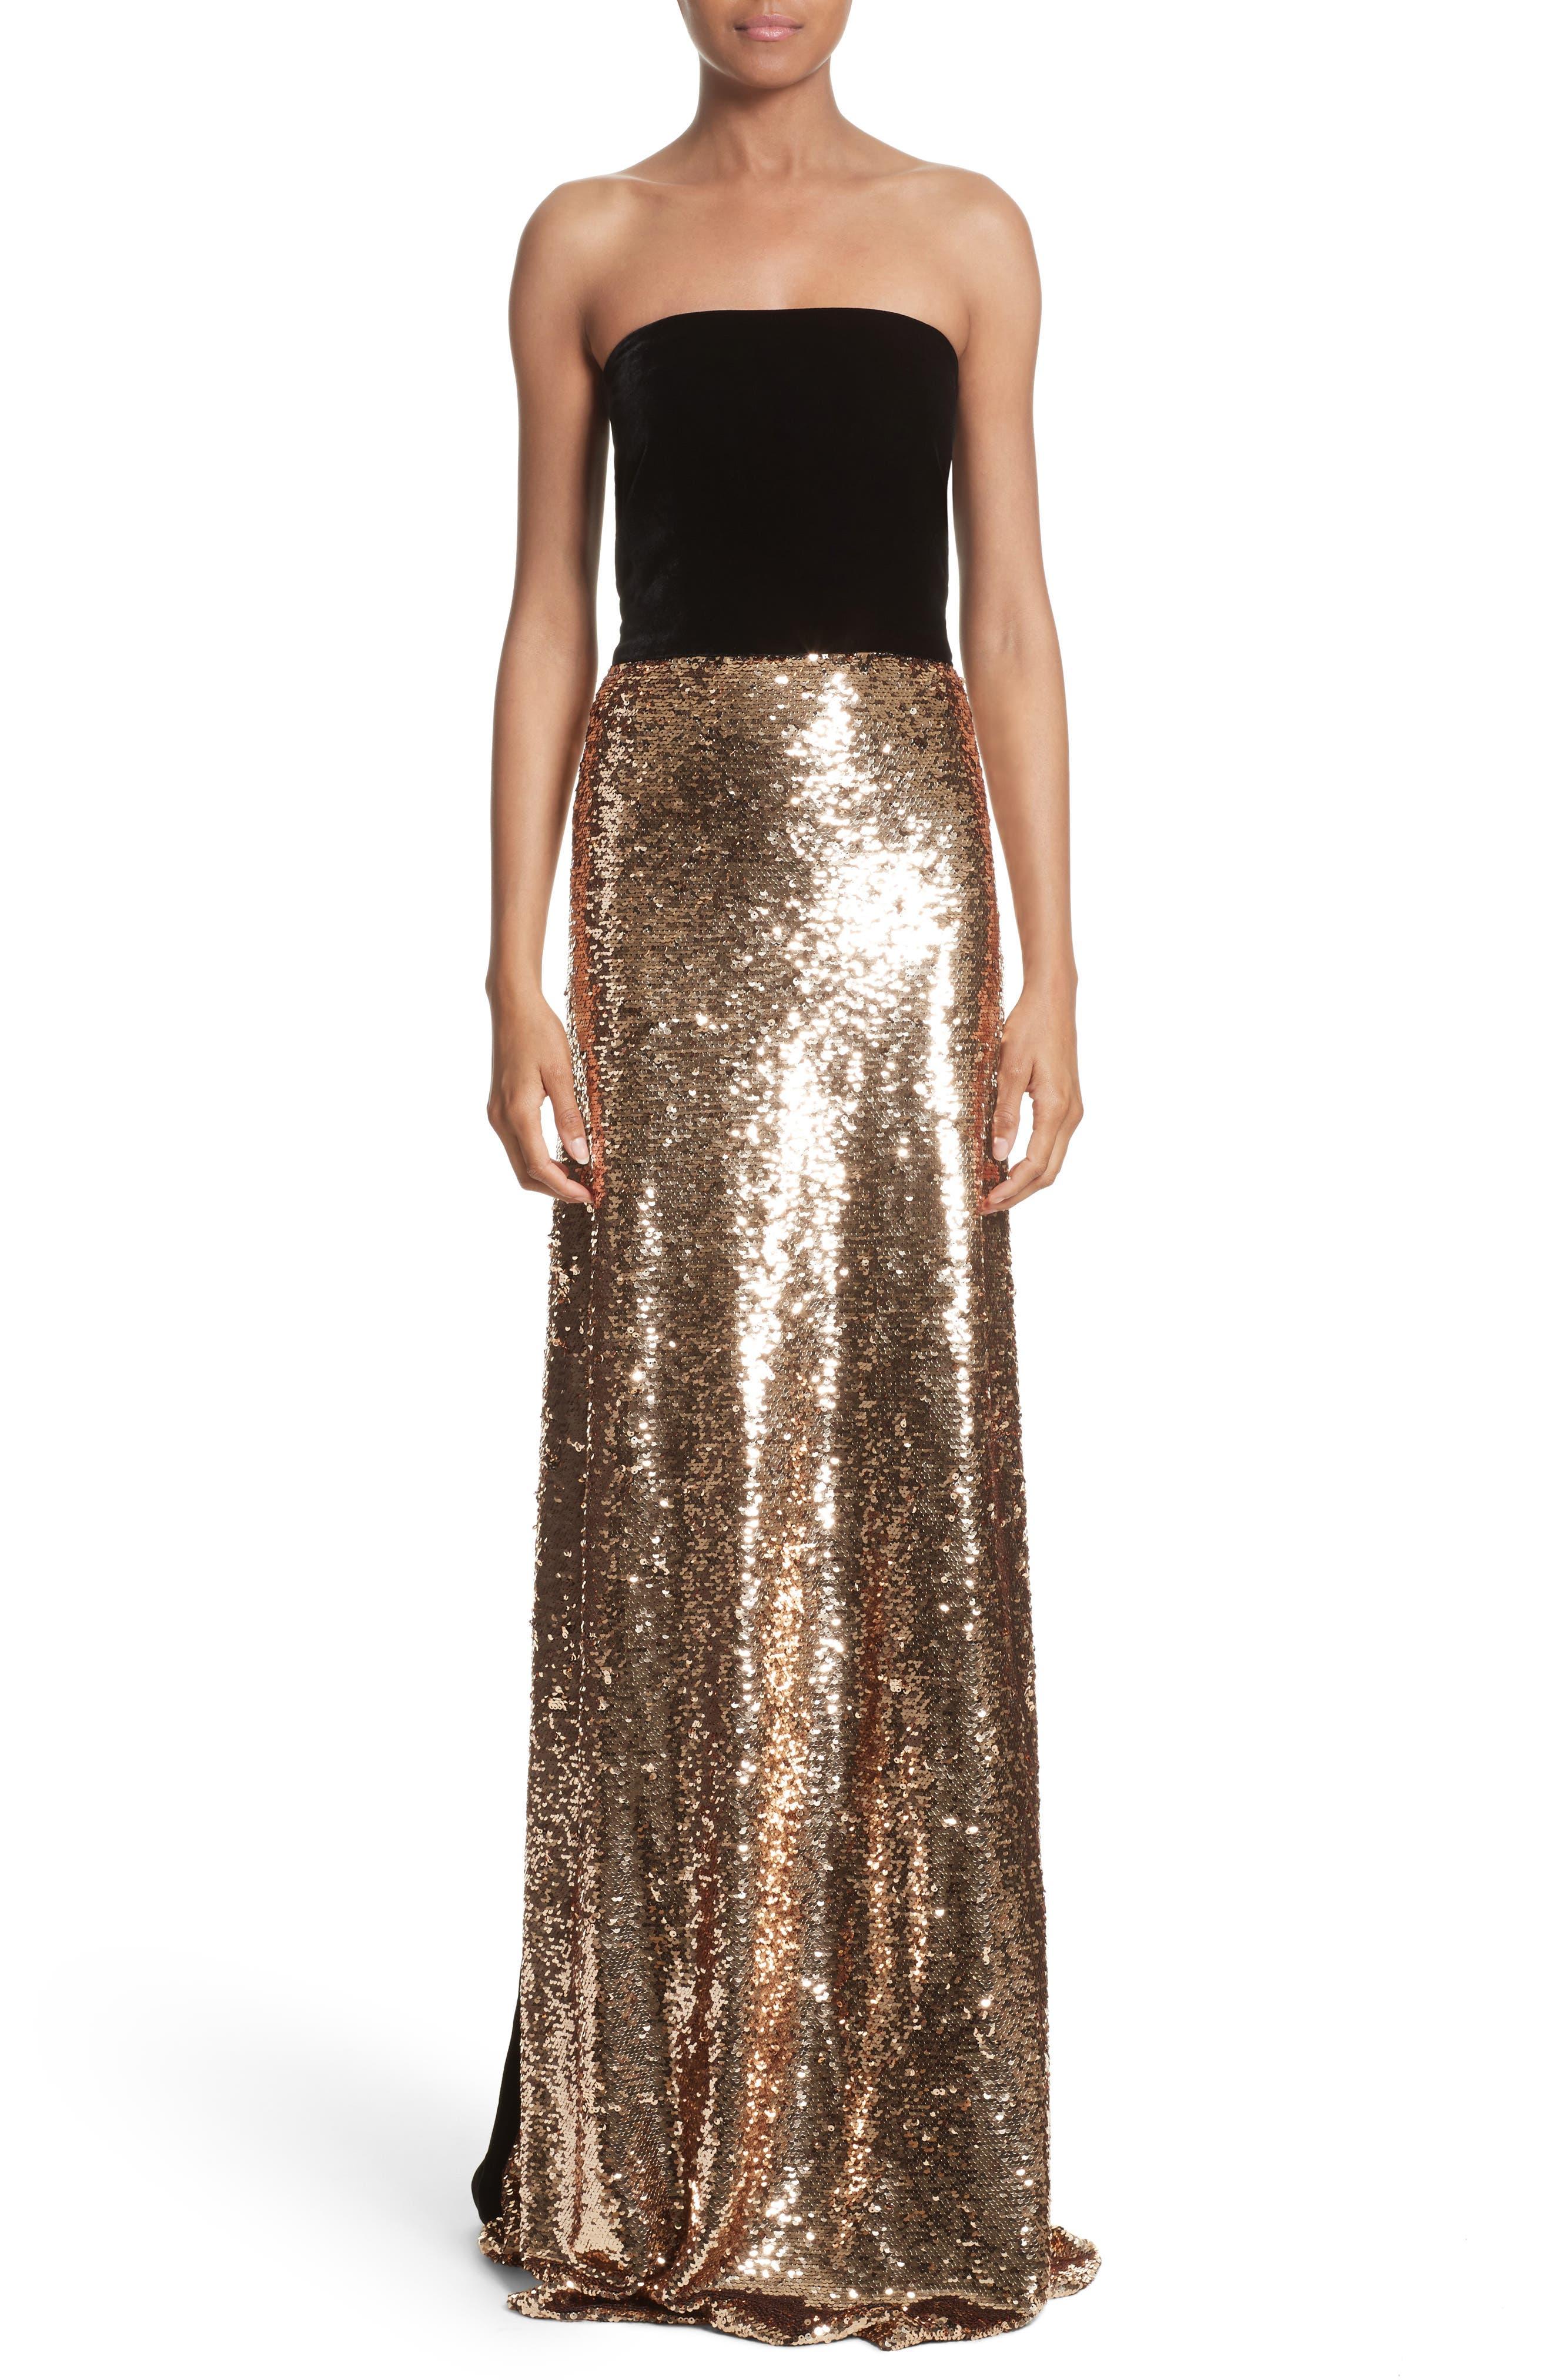 Monique Lhuillier Strapless Velvet & Sequin Gown